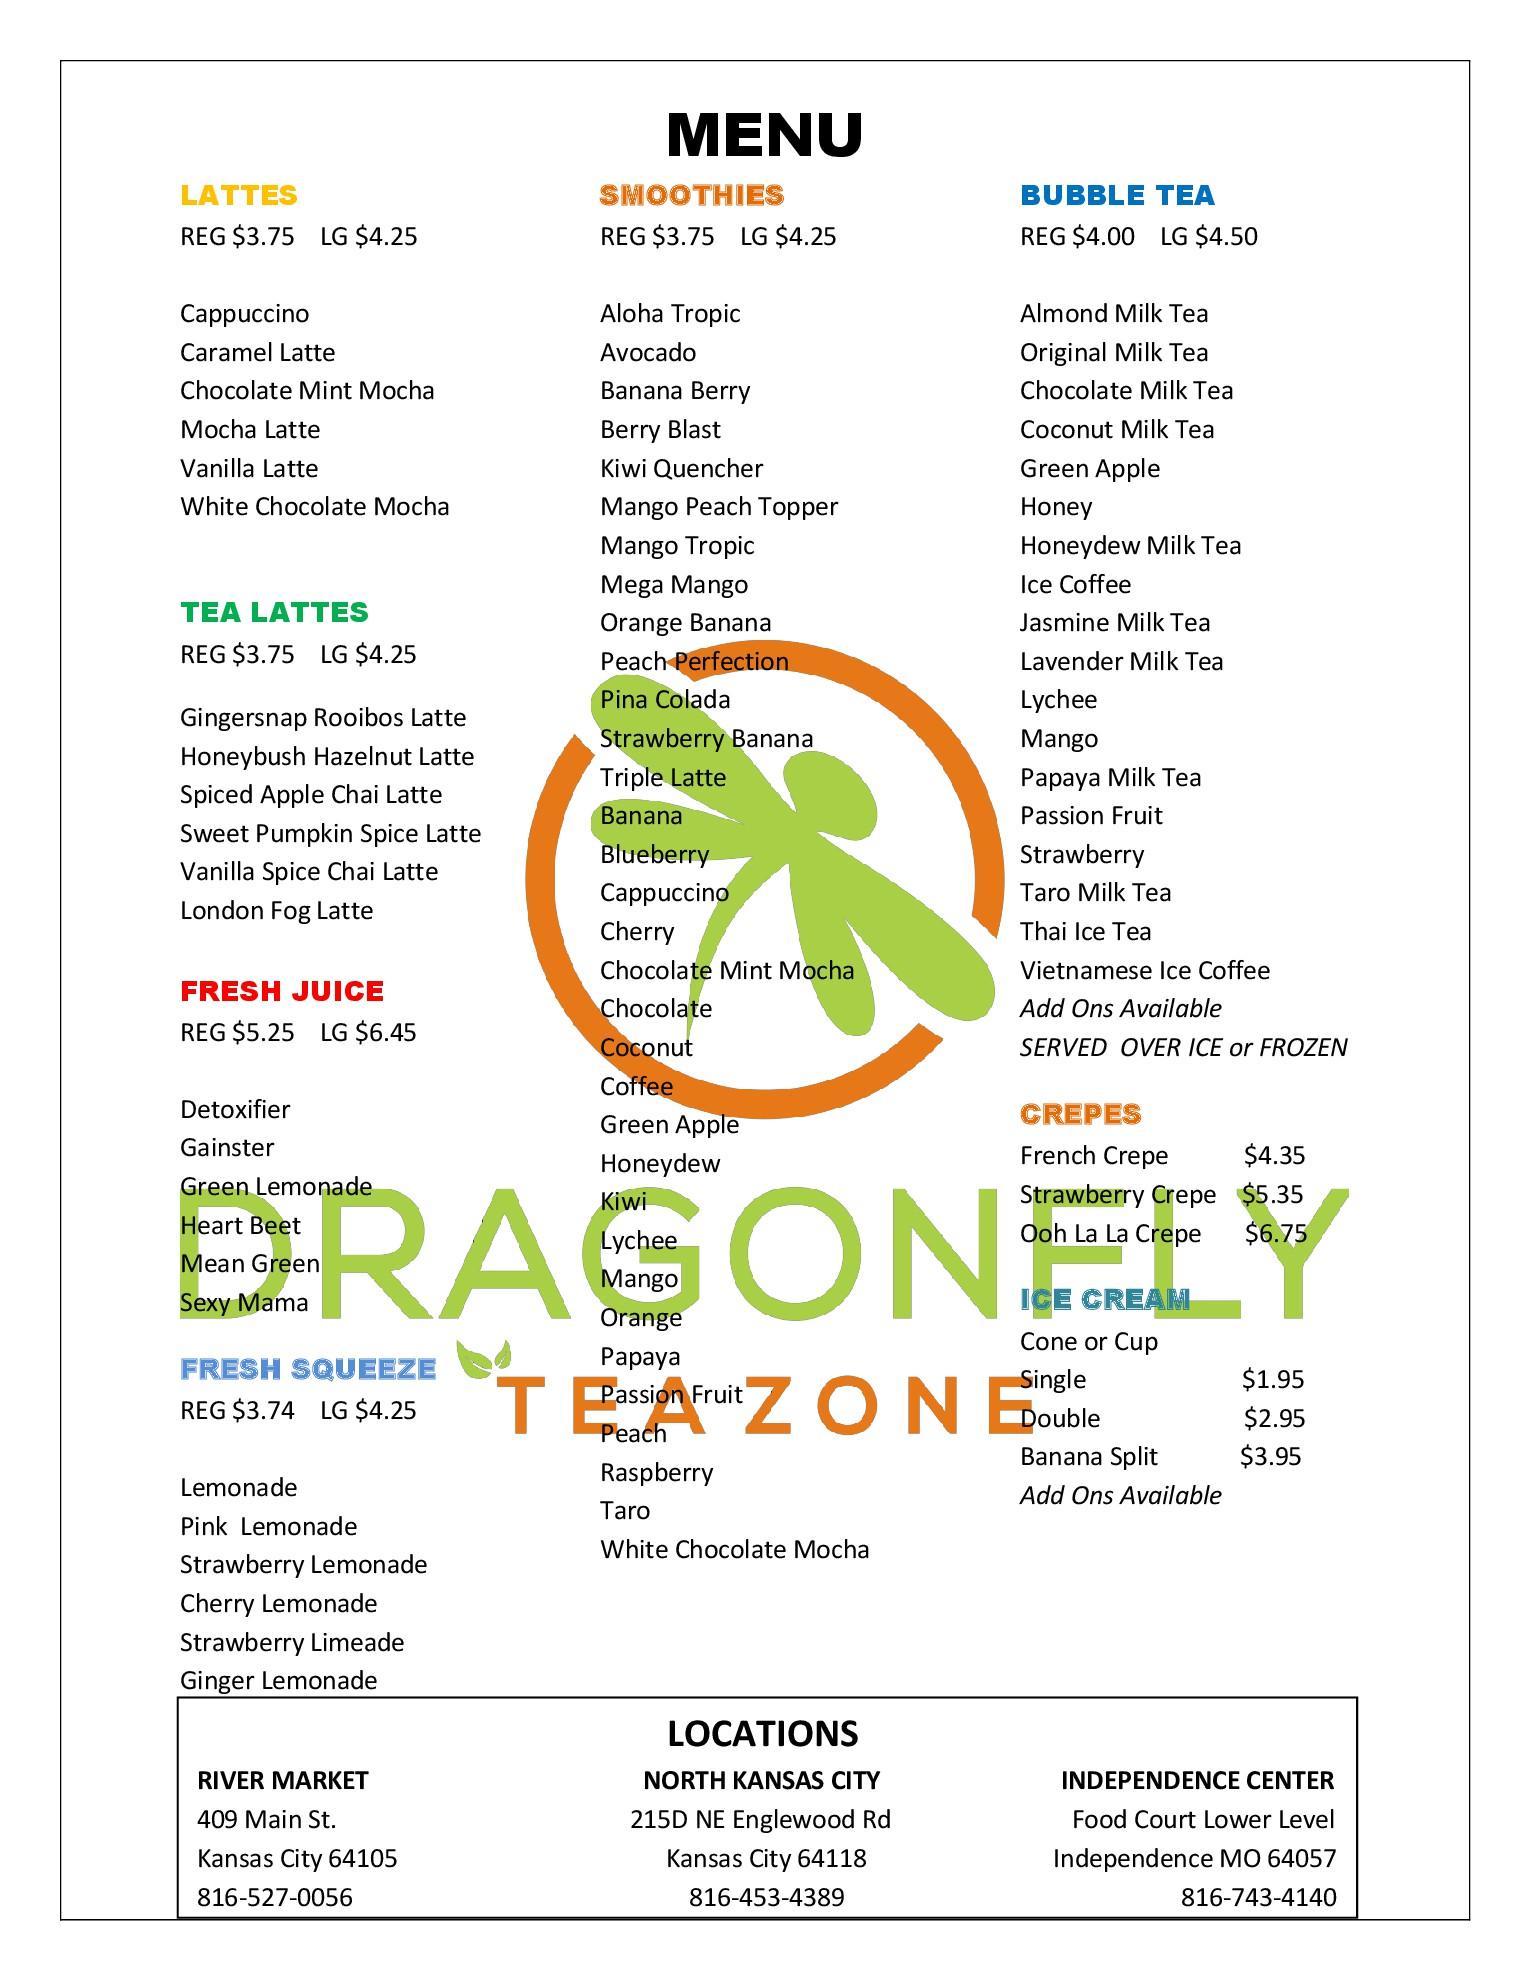 dragonfly-menu-2017v2.jpg